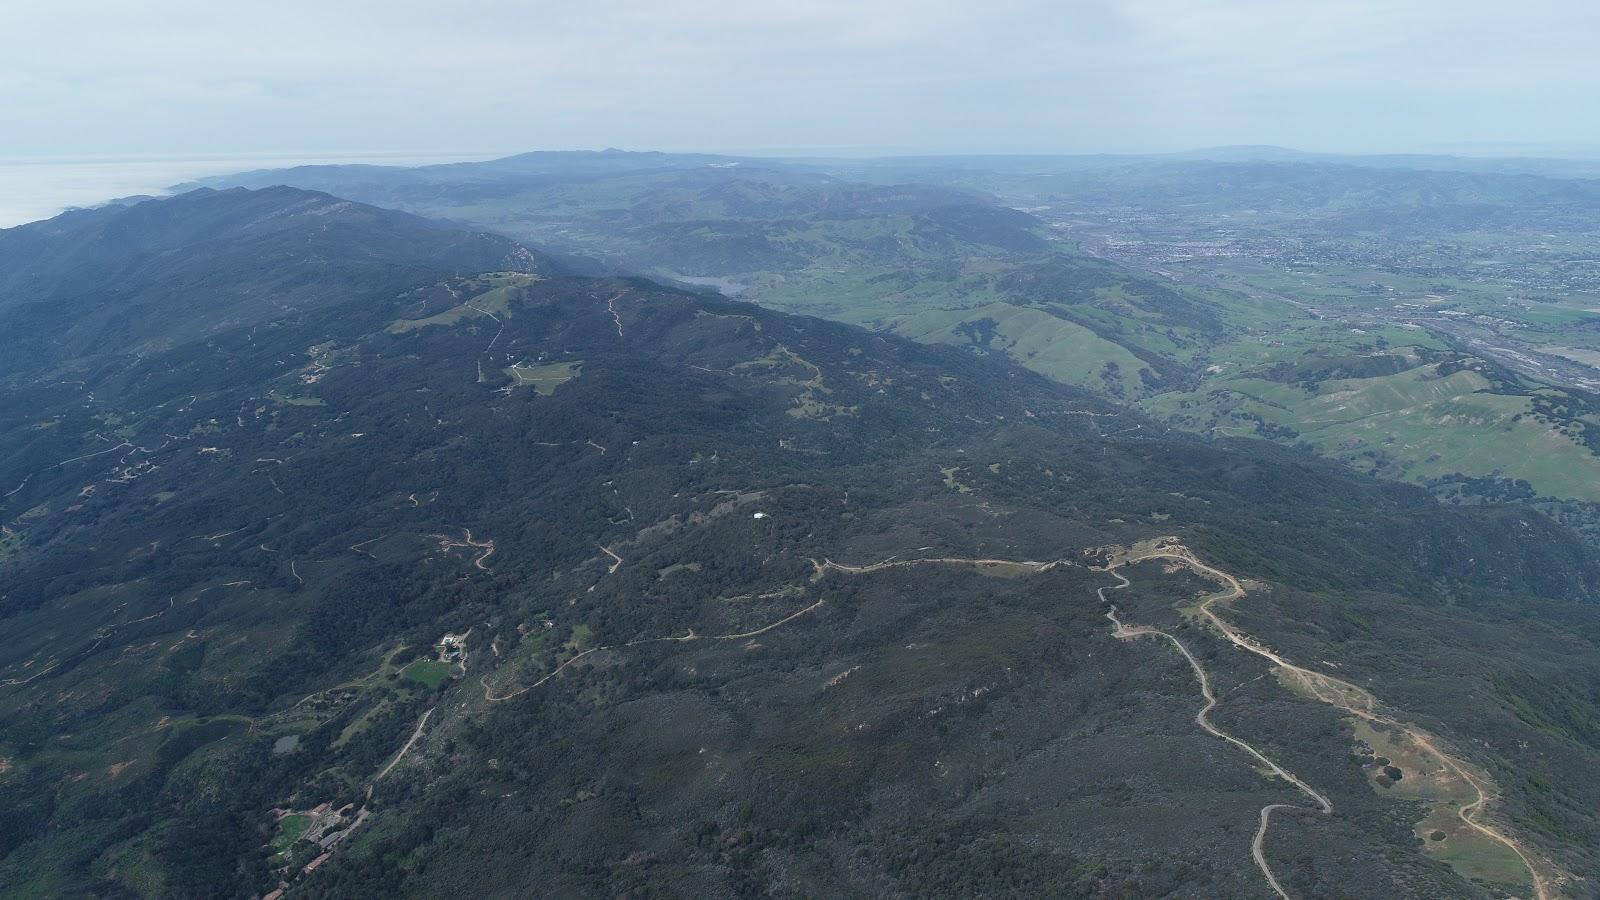 Aerial drone photo of Refugio Road Climb - W. Camino Cielo